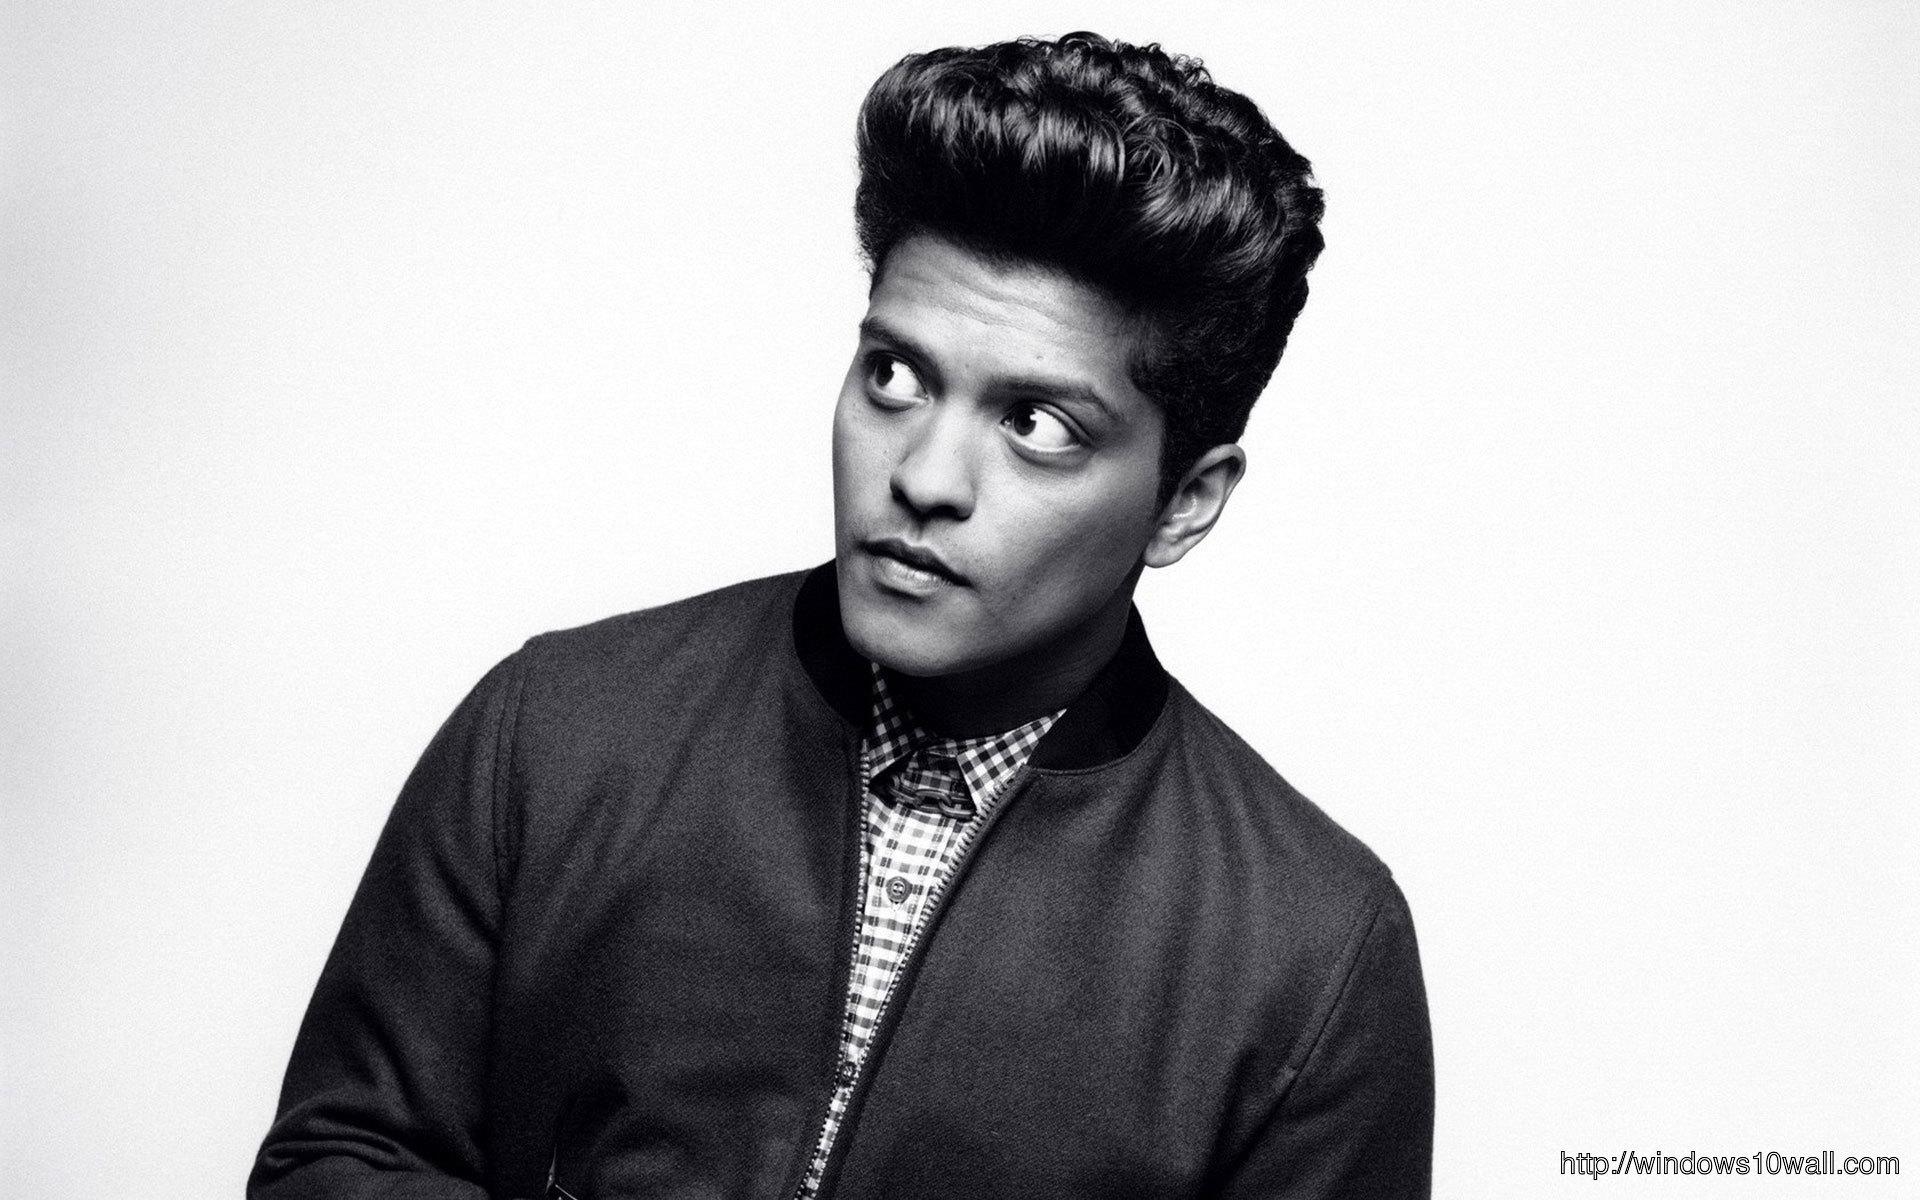 Bruno Mars Bw Background Wallpaper